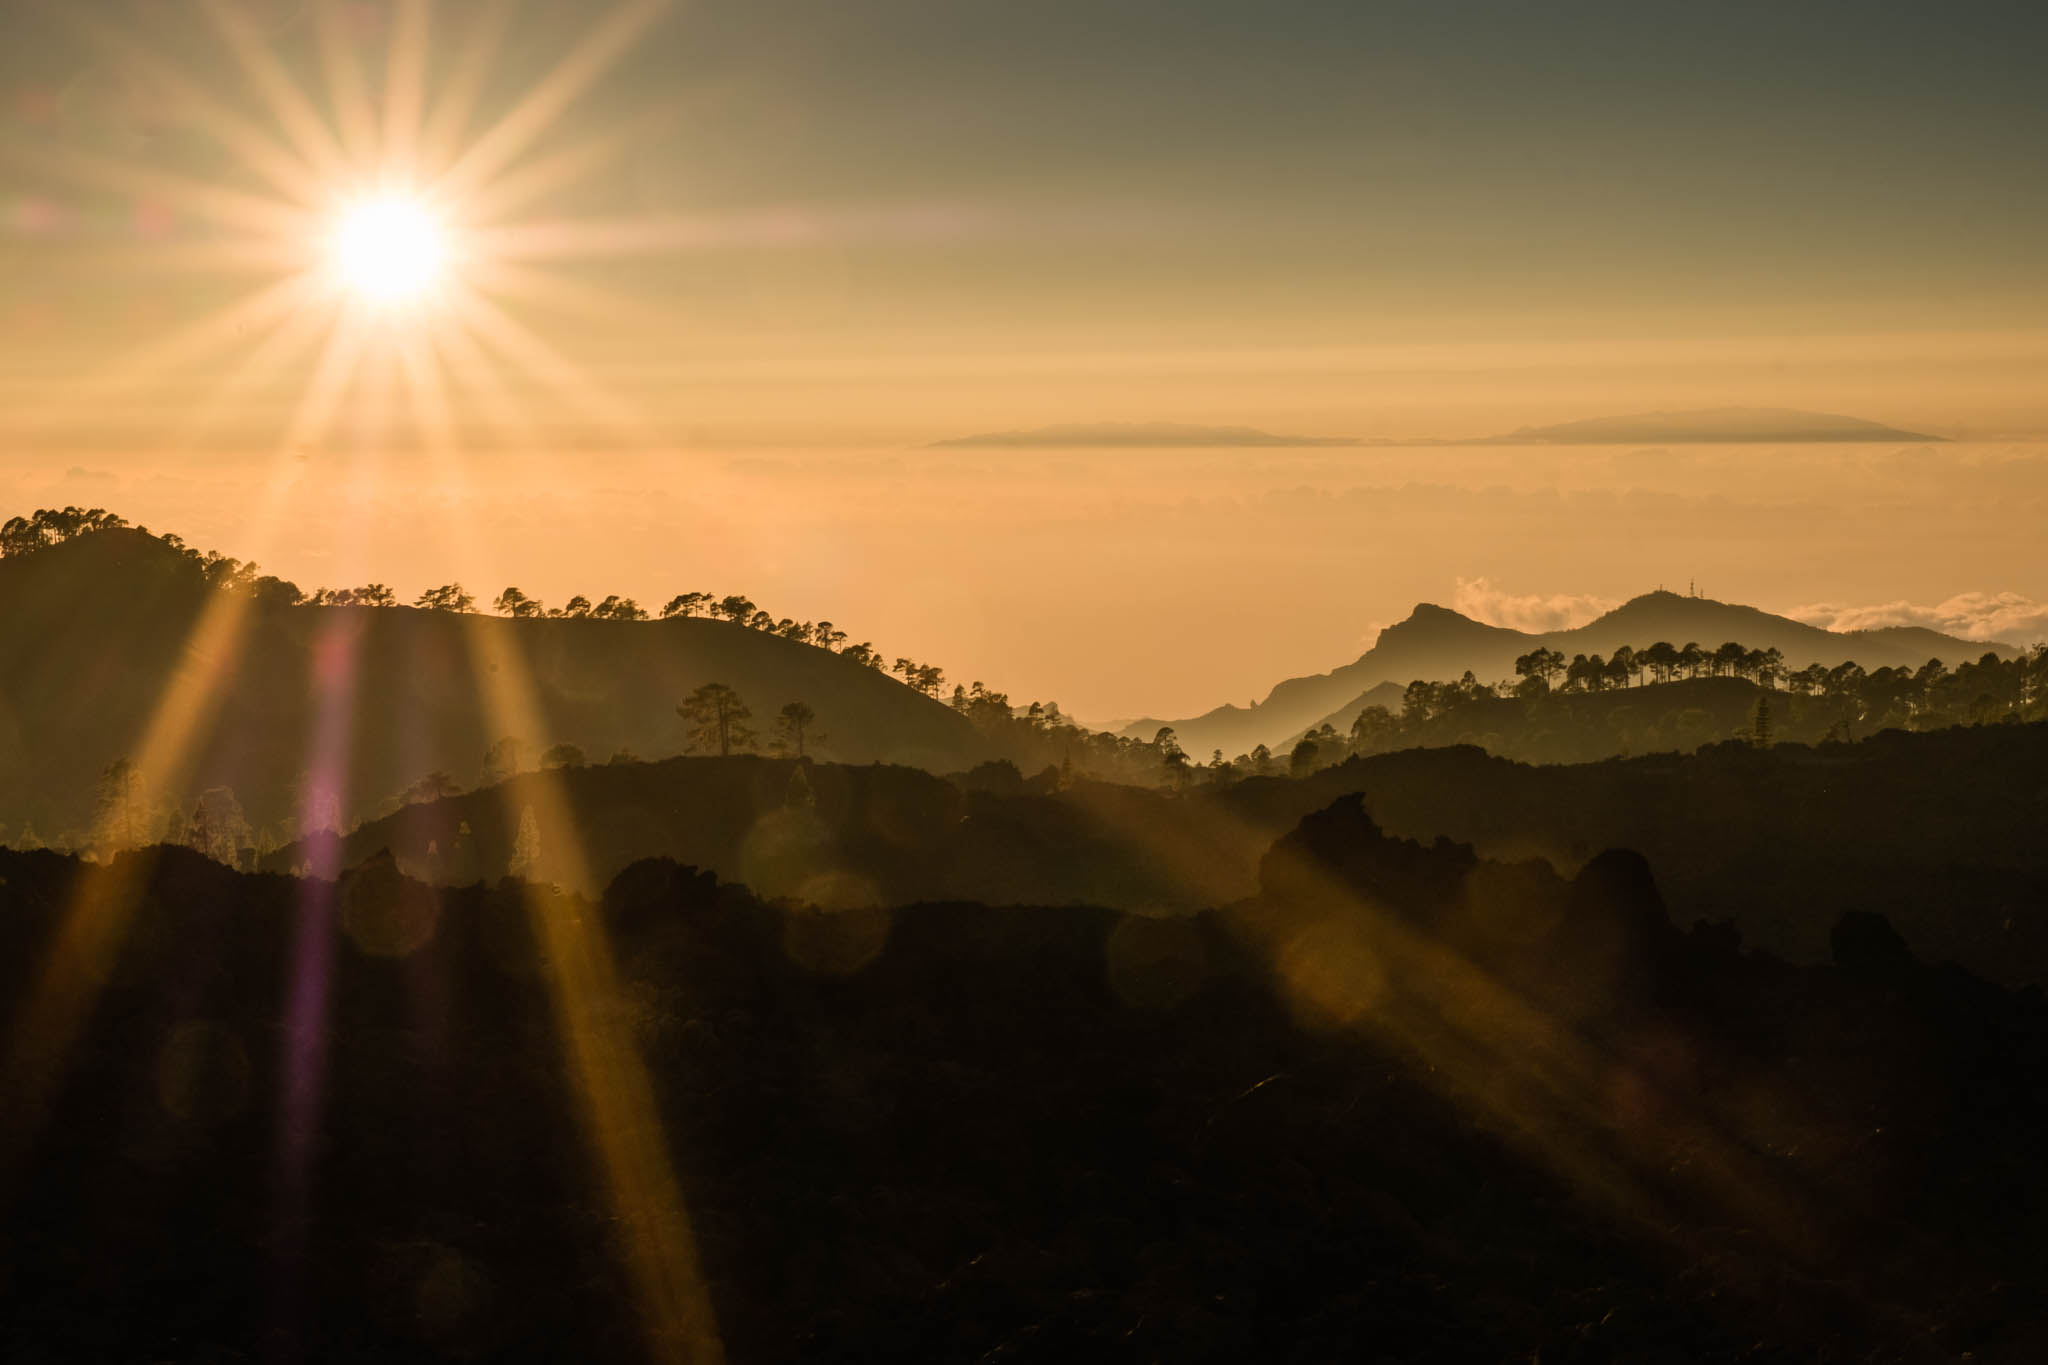 Landschaftsfotografie Birgit Rilk: Teneriffa